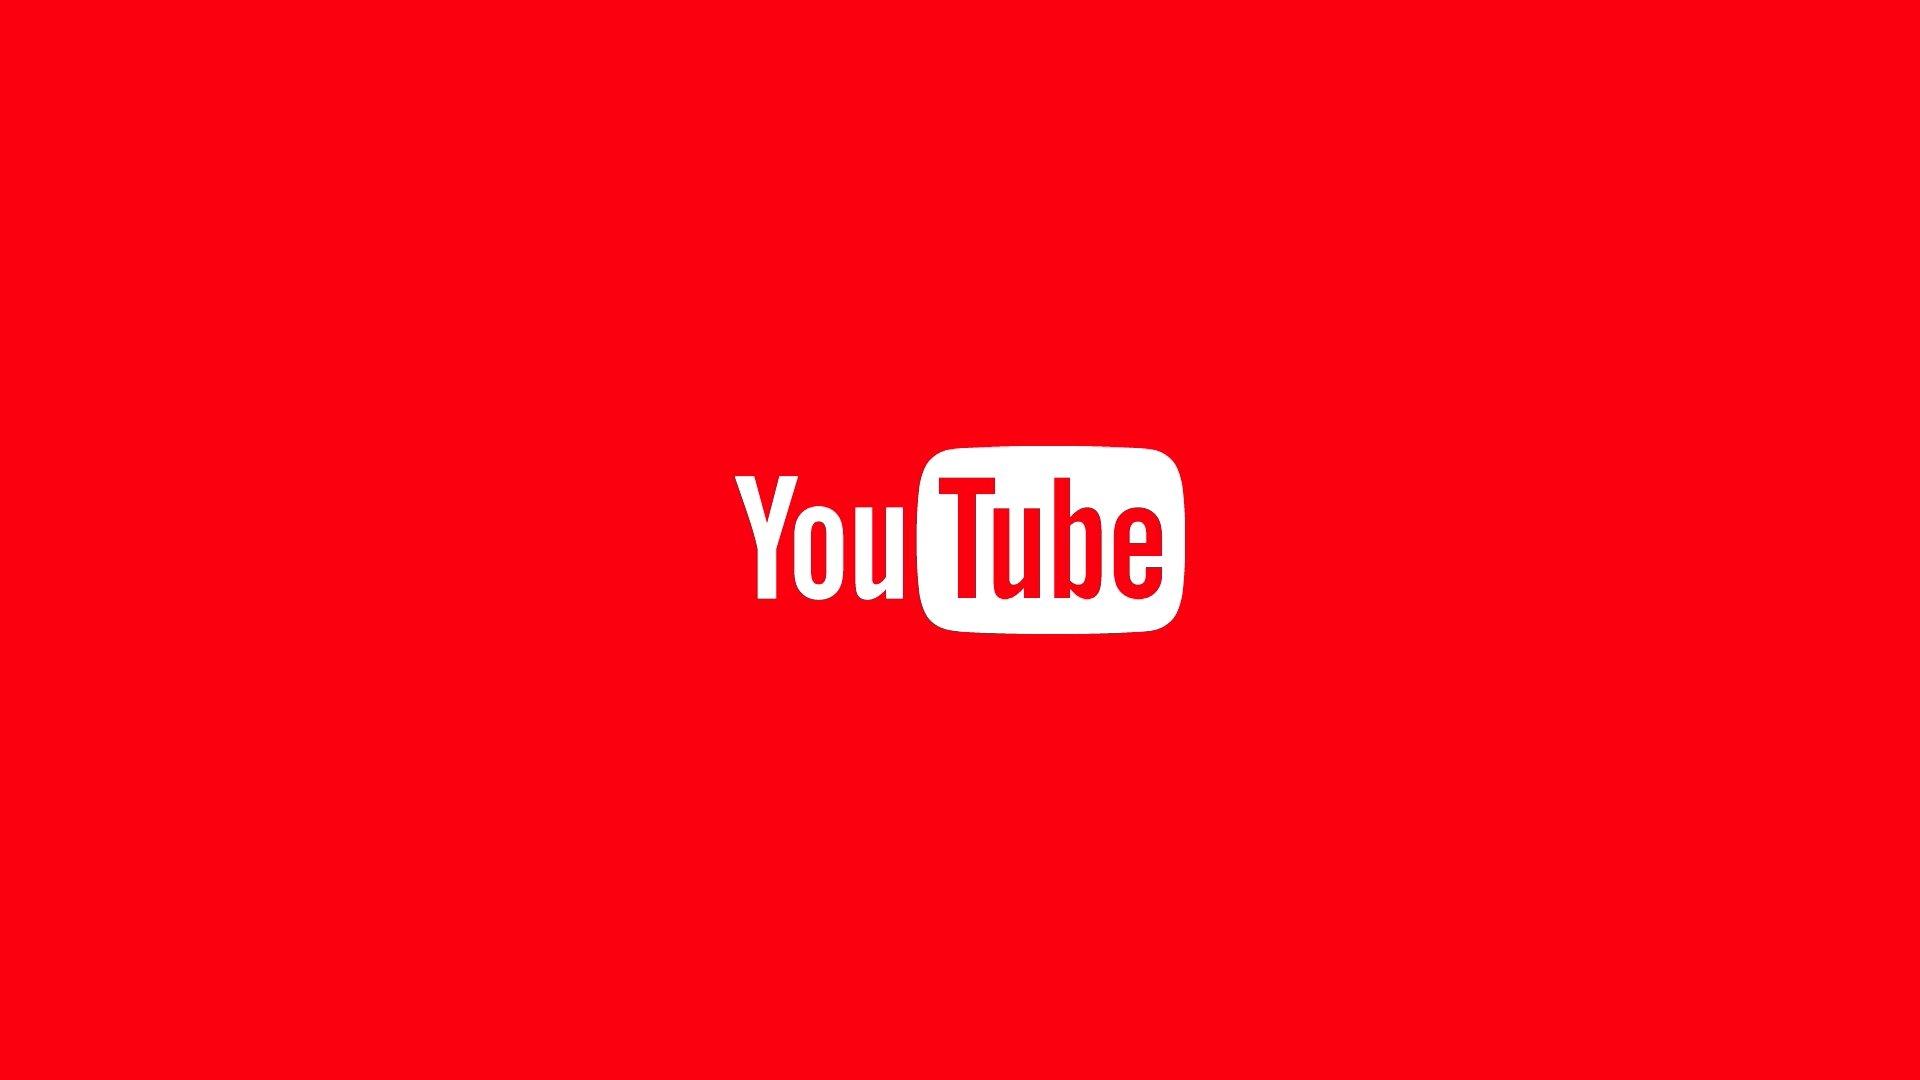 Yotuube logo vermelho